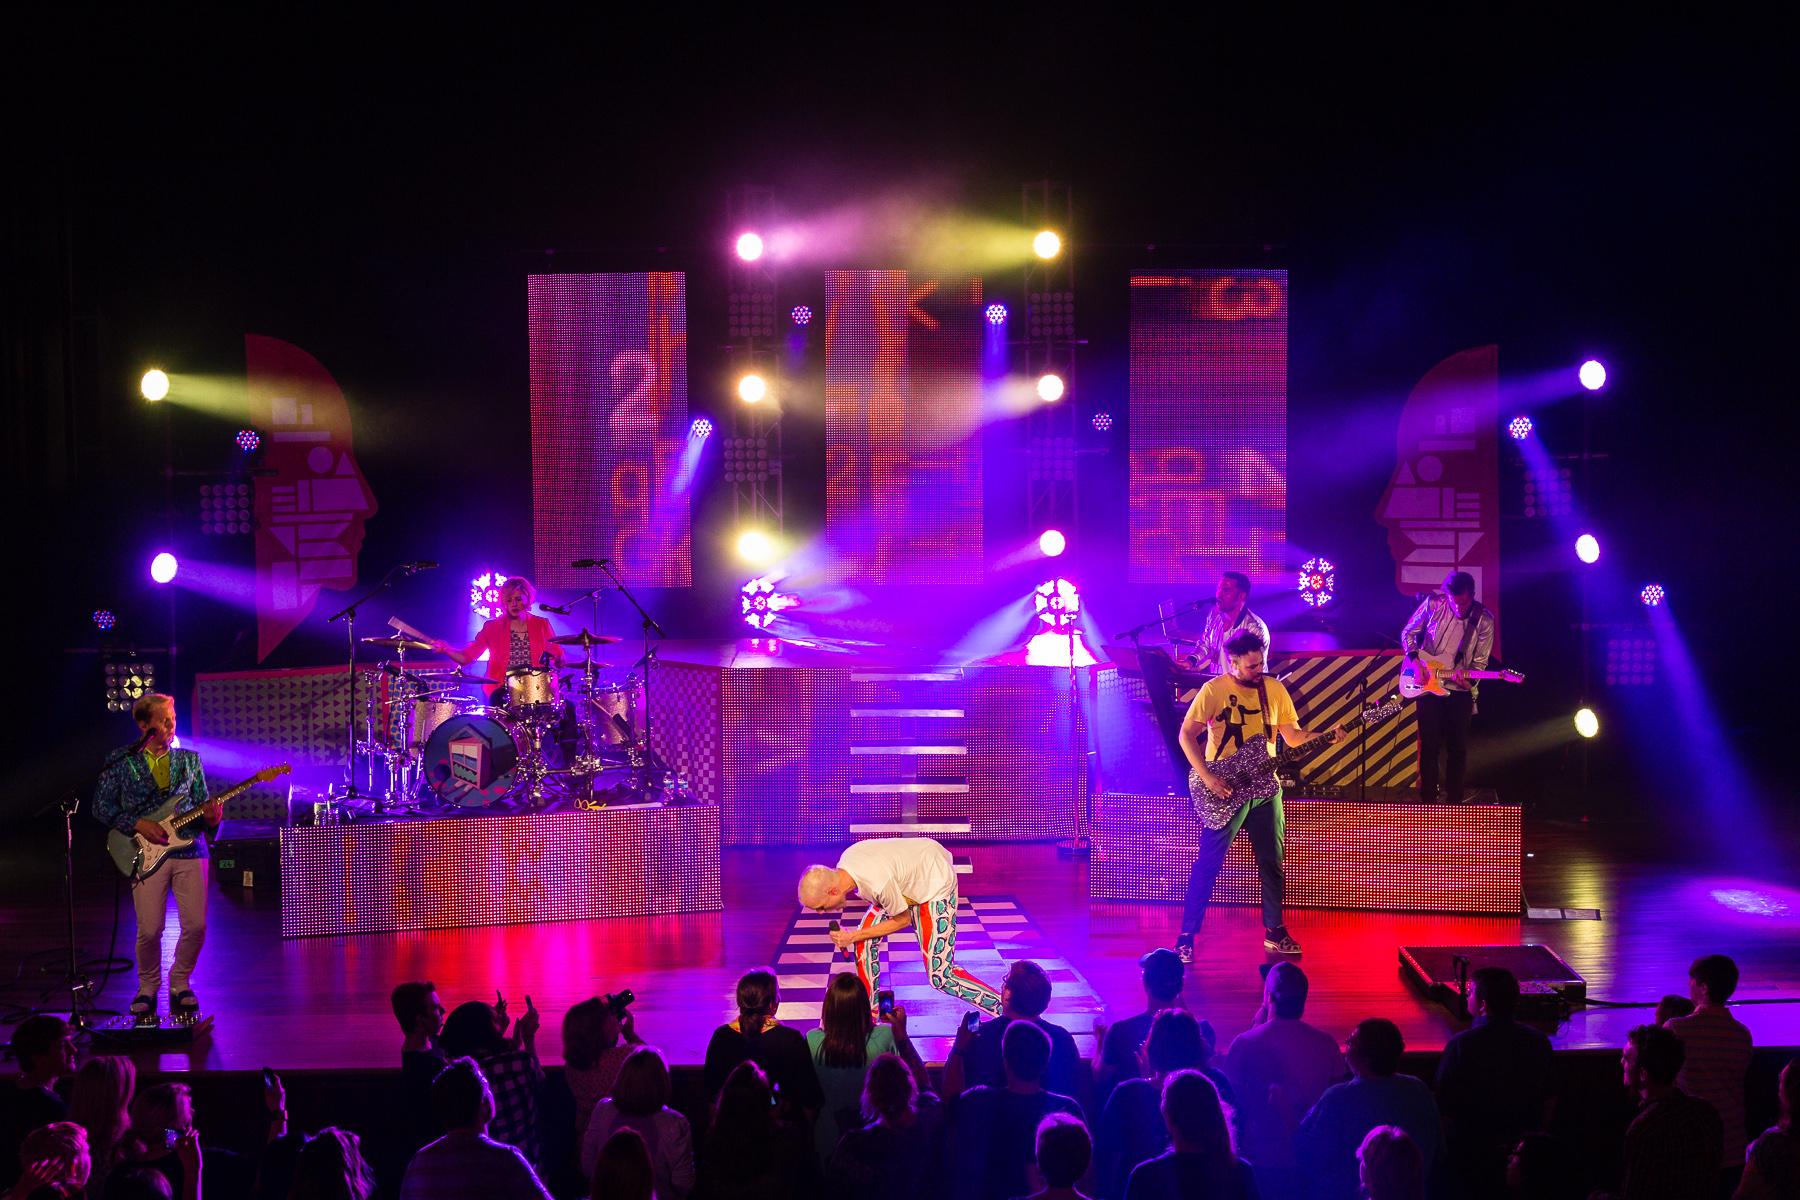 Neon Trees  Pop Psychology Tour - Ryman Auditorium Nashville, TN  May 12, 2014